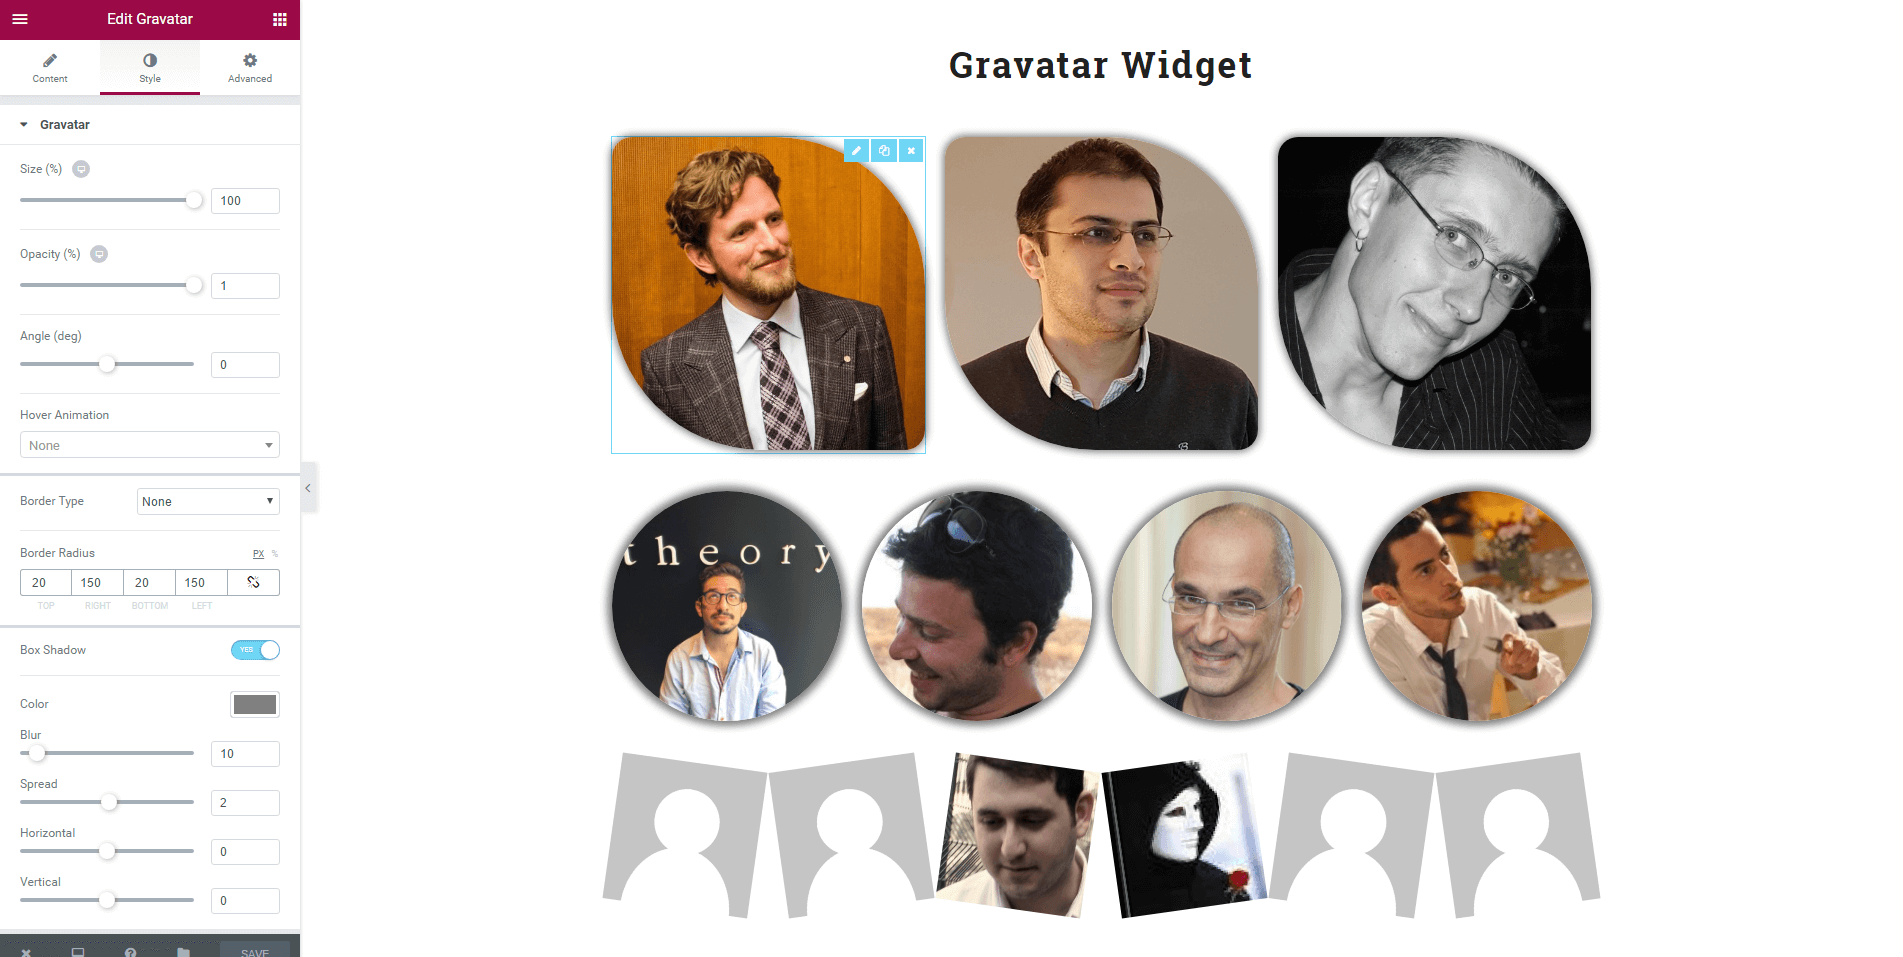 Display Gravatars based on an email address.